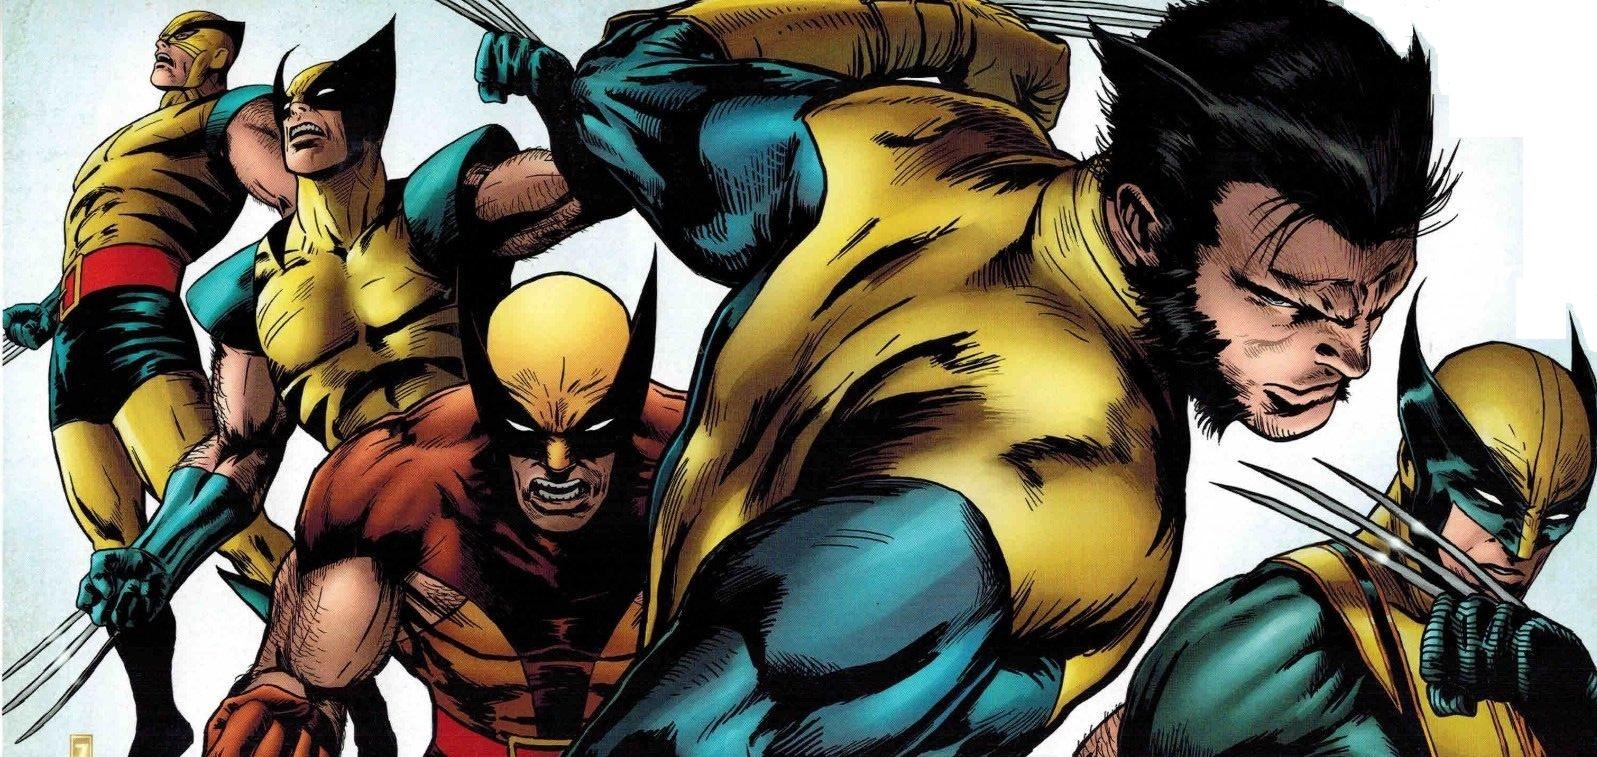 FF-3-X-Men-Evolutions-Wolverine-Variant-350906604406